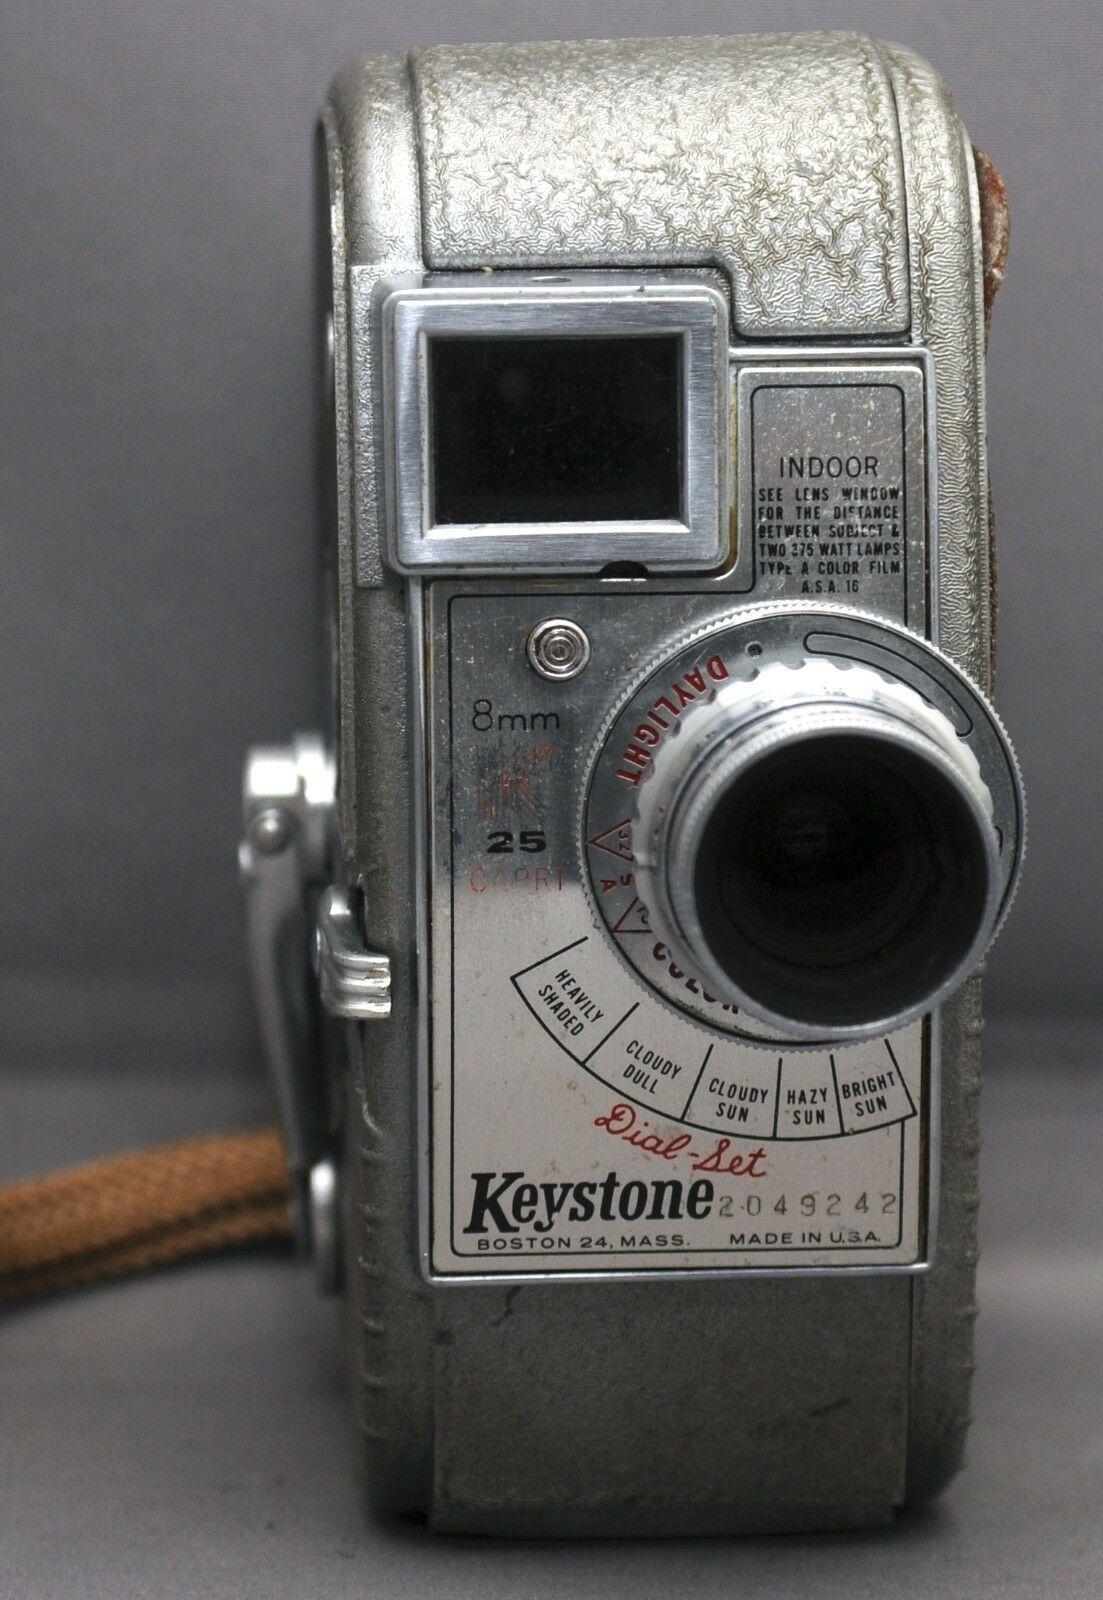 Keystone Dial-Set Capri 8mm Vintage Movie and 49 similar items